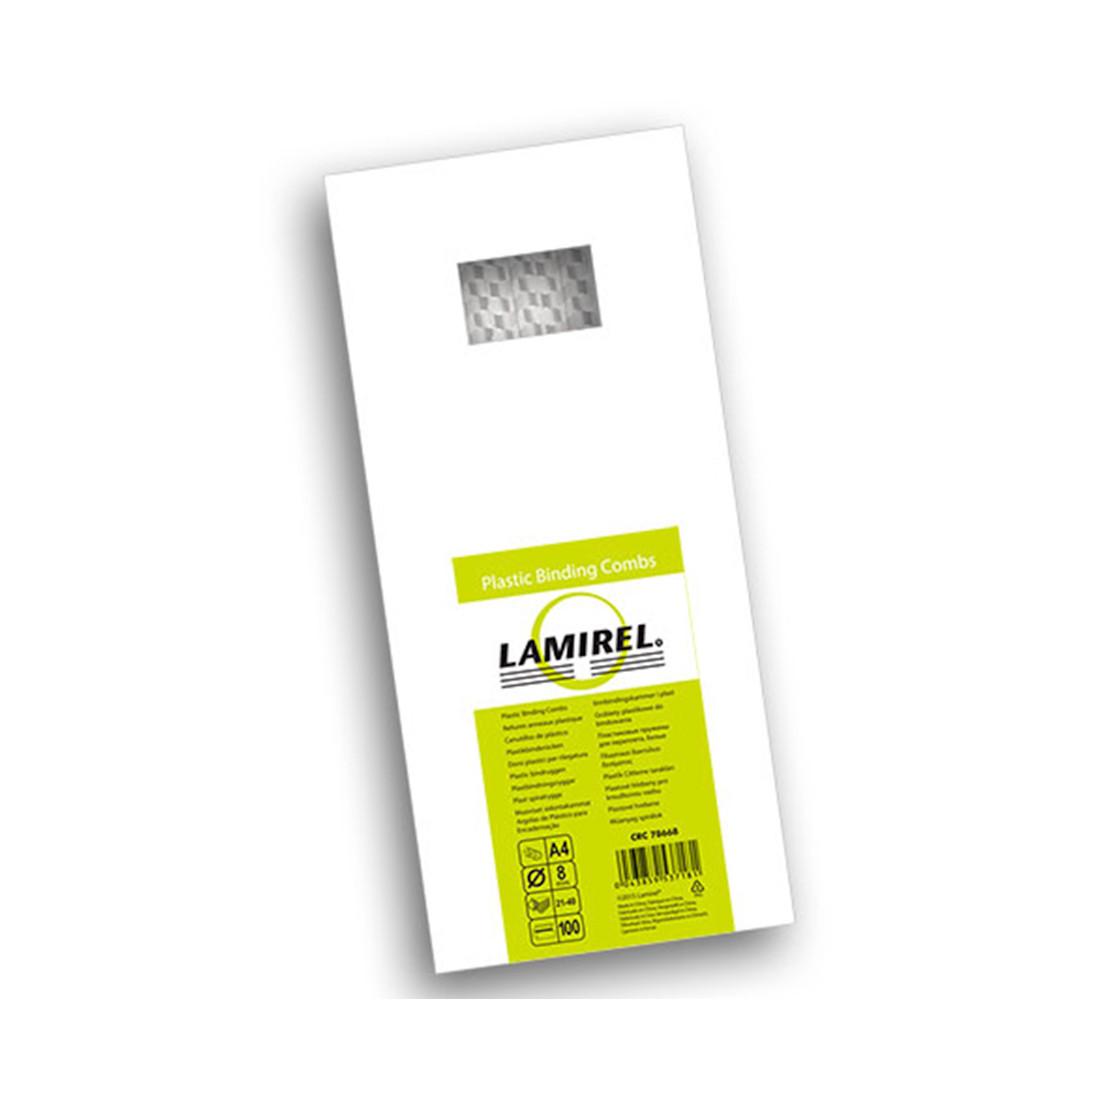 Пружина пластиковая Lamirel LA-78668, 8 мм. Цвет: белый, 100 шт